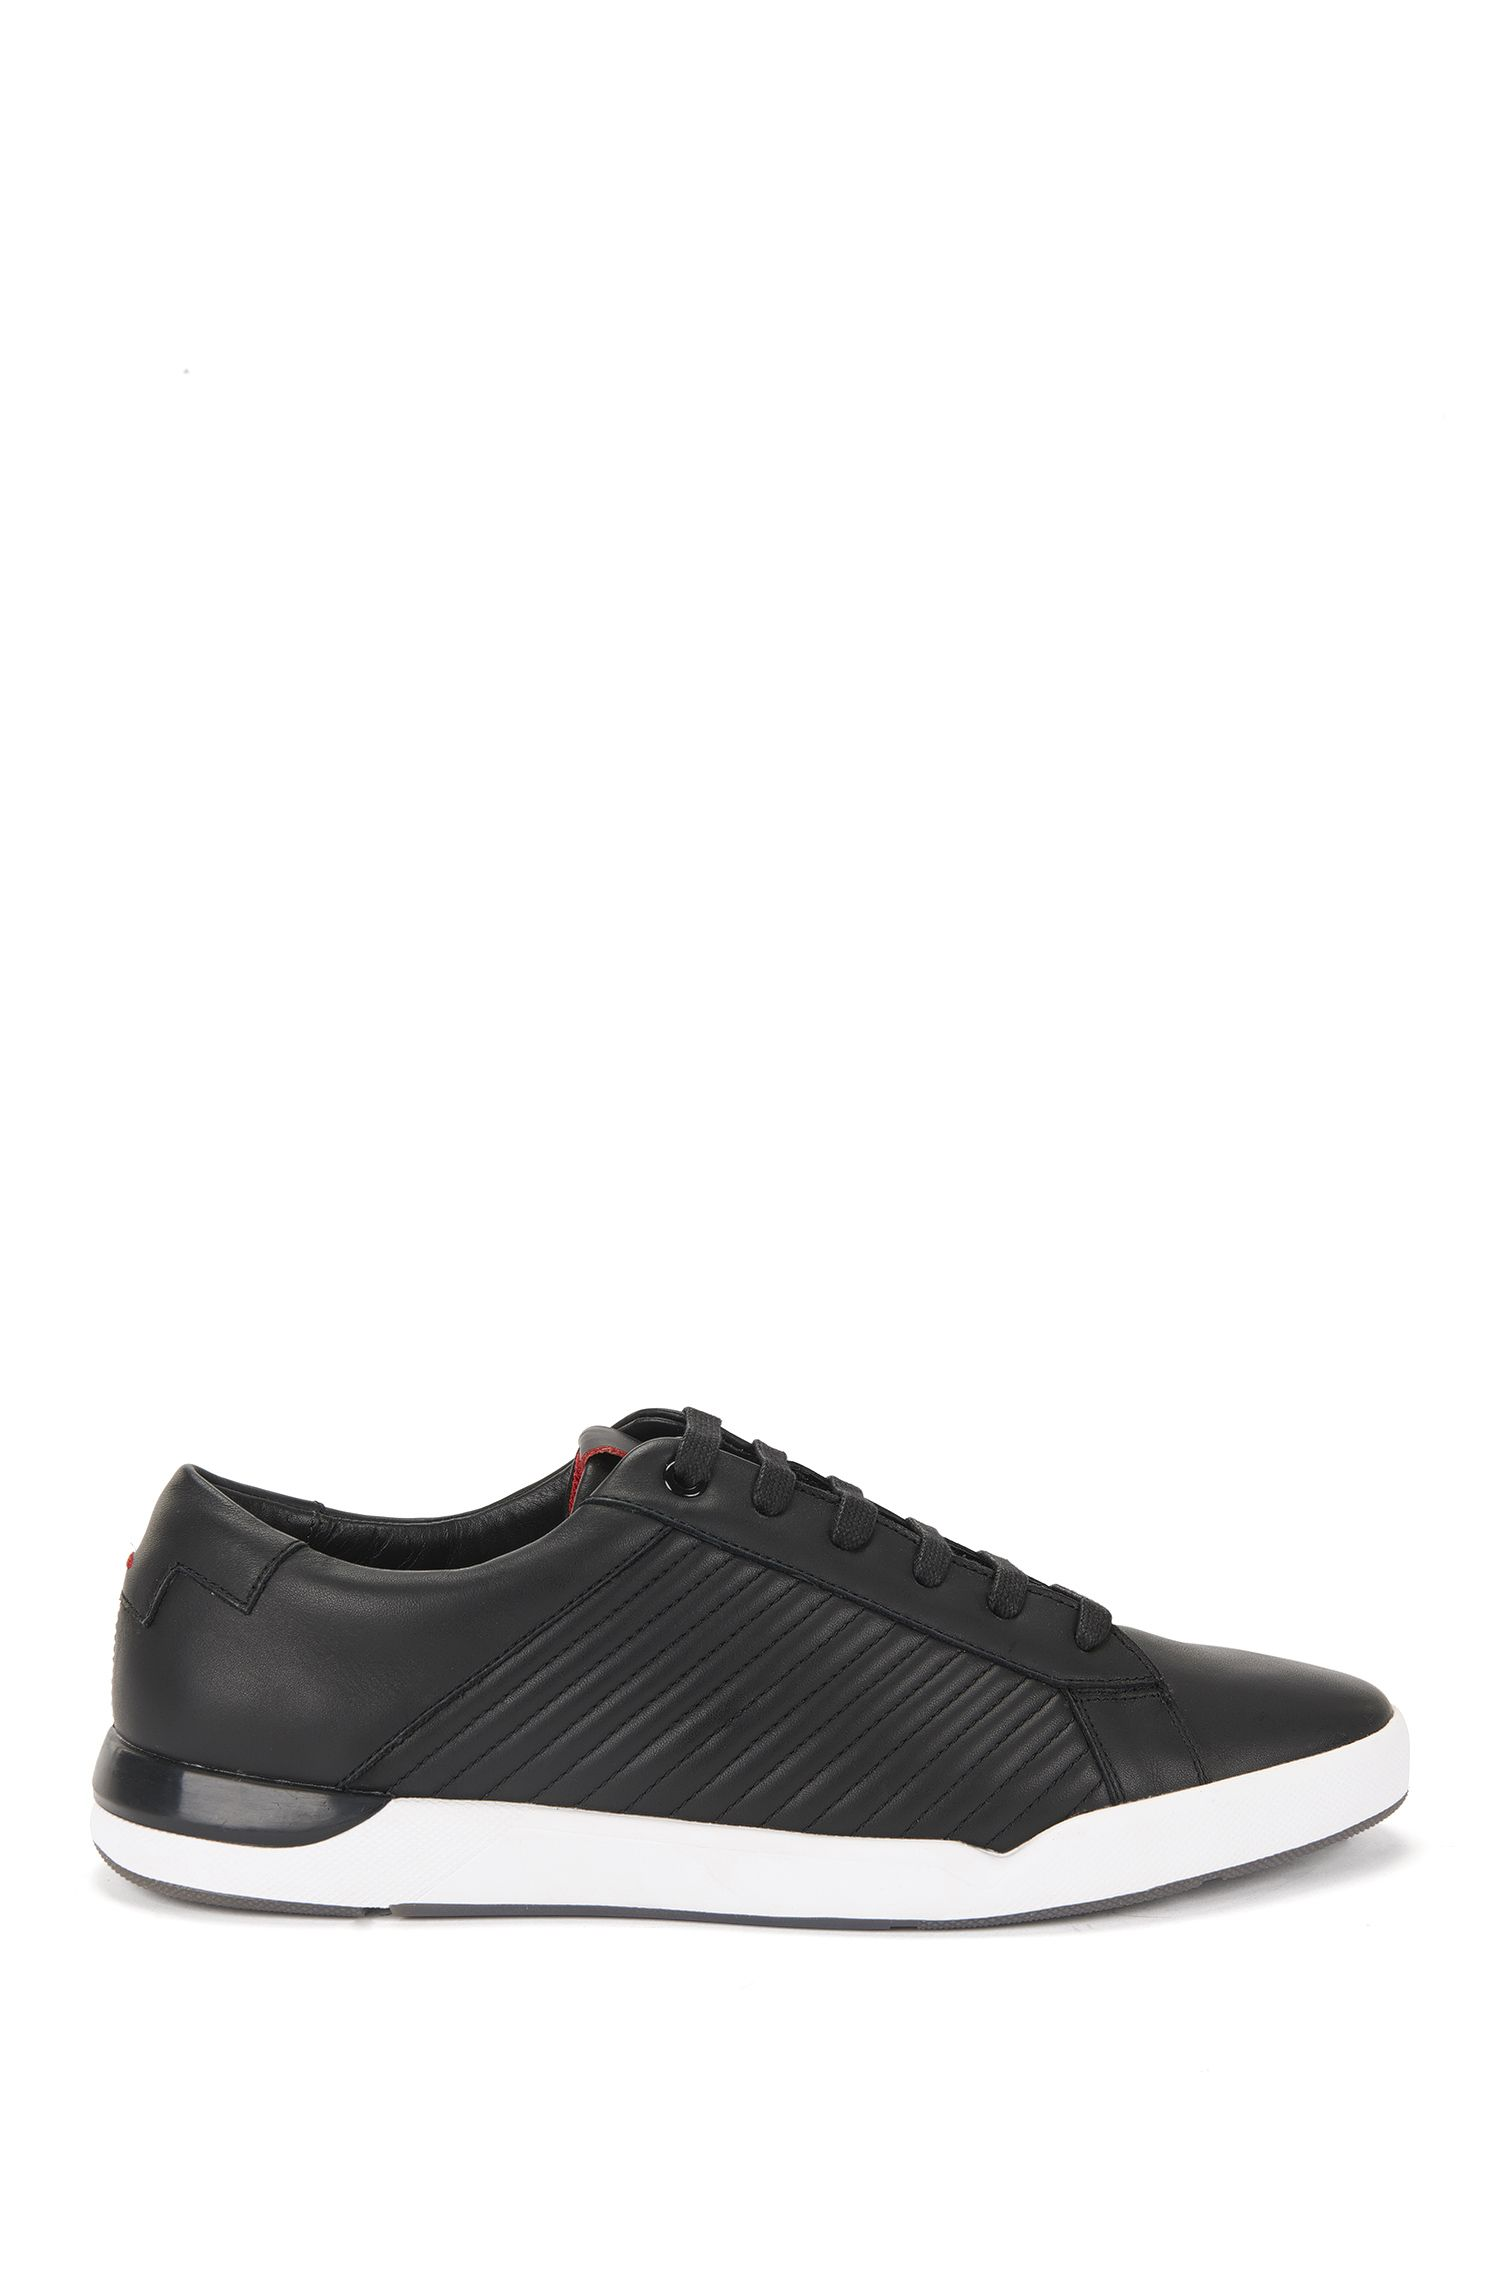 Sneakers in pelle con impunture: 'Fusion_Tenn_Itma'